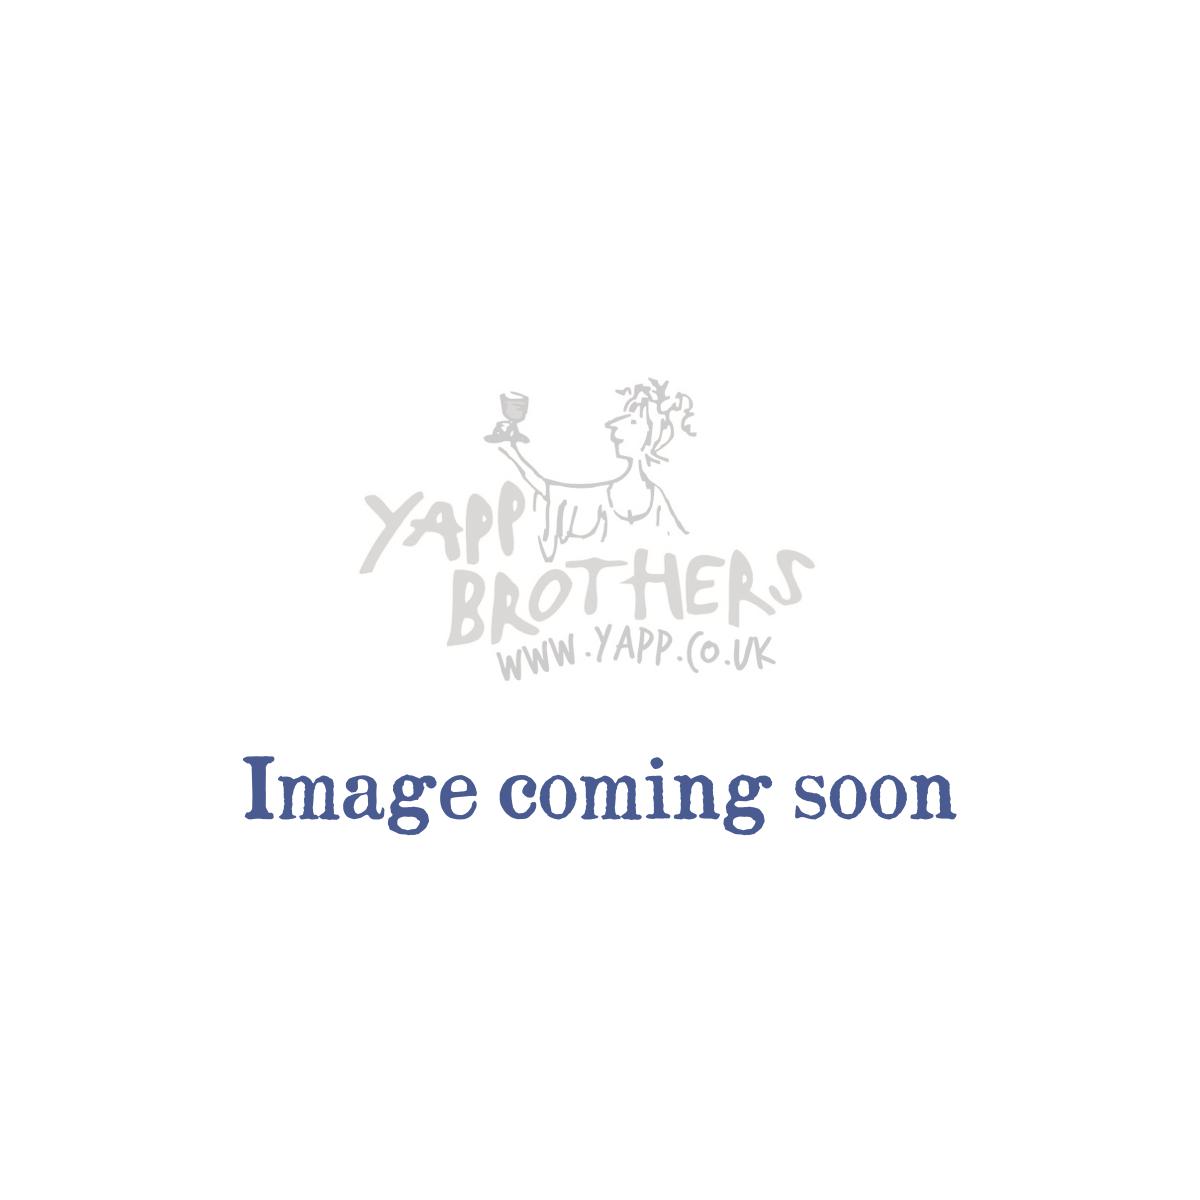 Tinto Negro: Uco Valley Mendoza Malbec 'Vineyard 1955' 2018 - Bottle